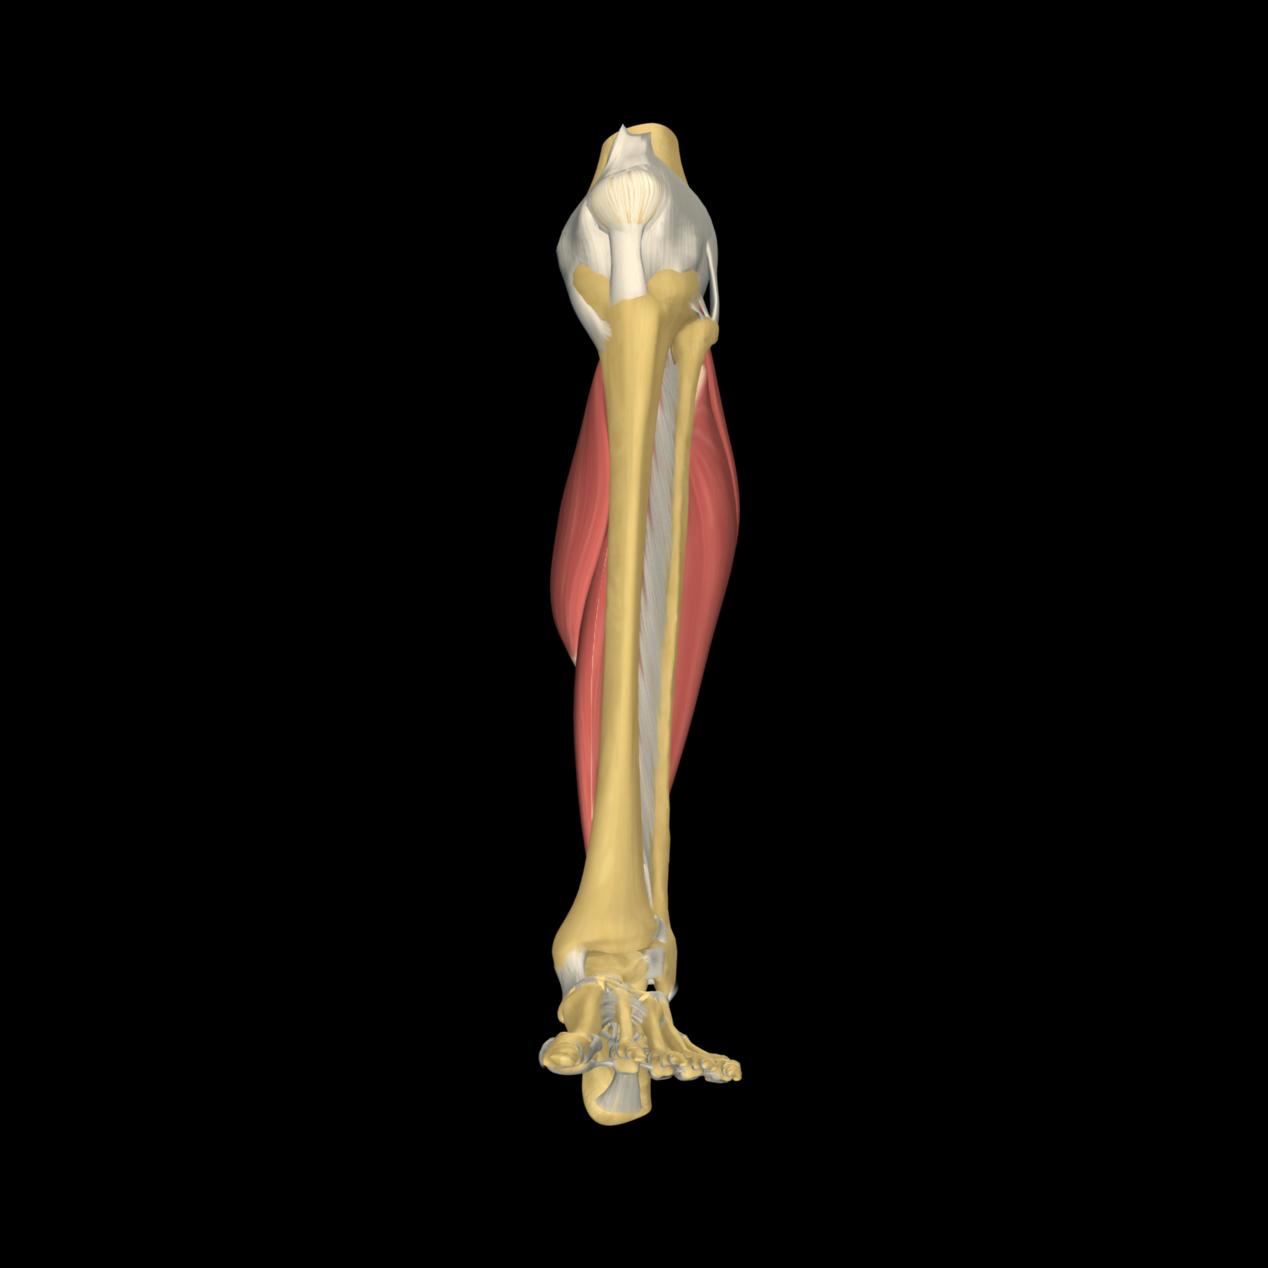 anatomyEXPERT - Plantar calcaneocuboid ligament - Structure Detail